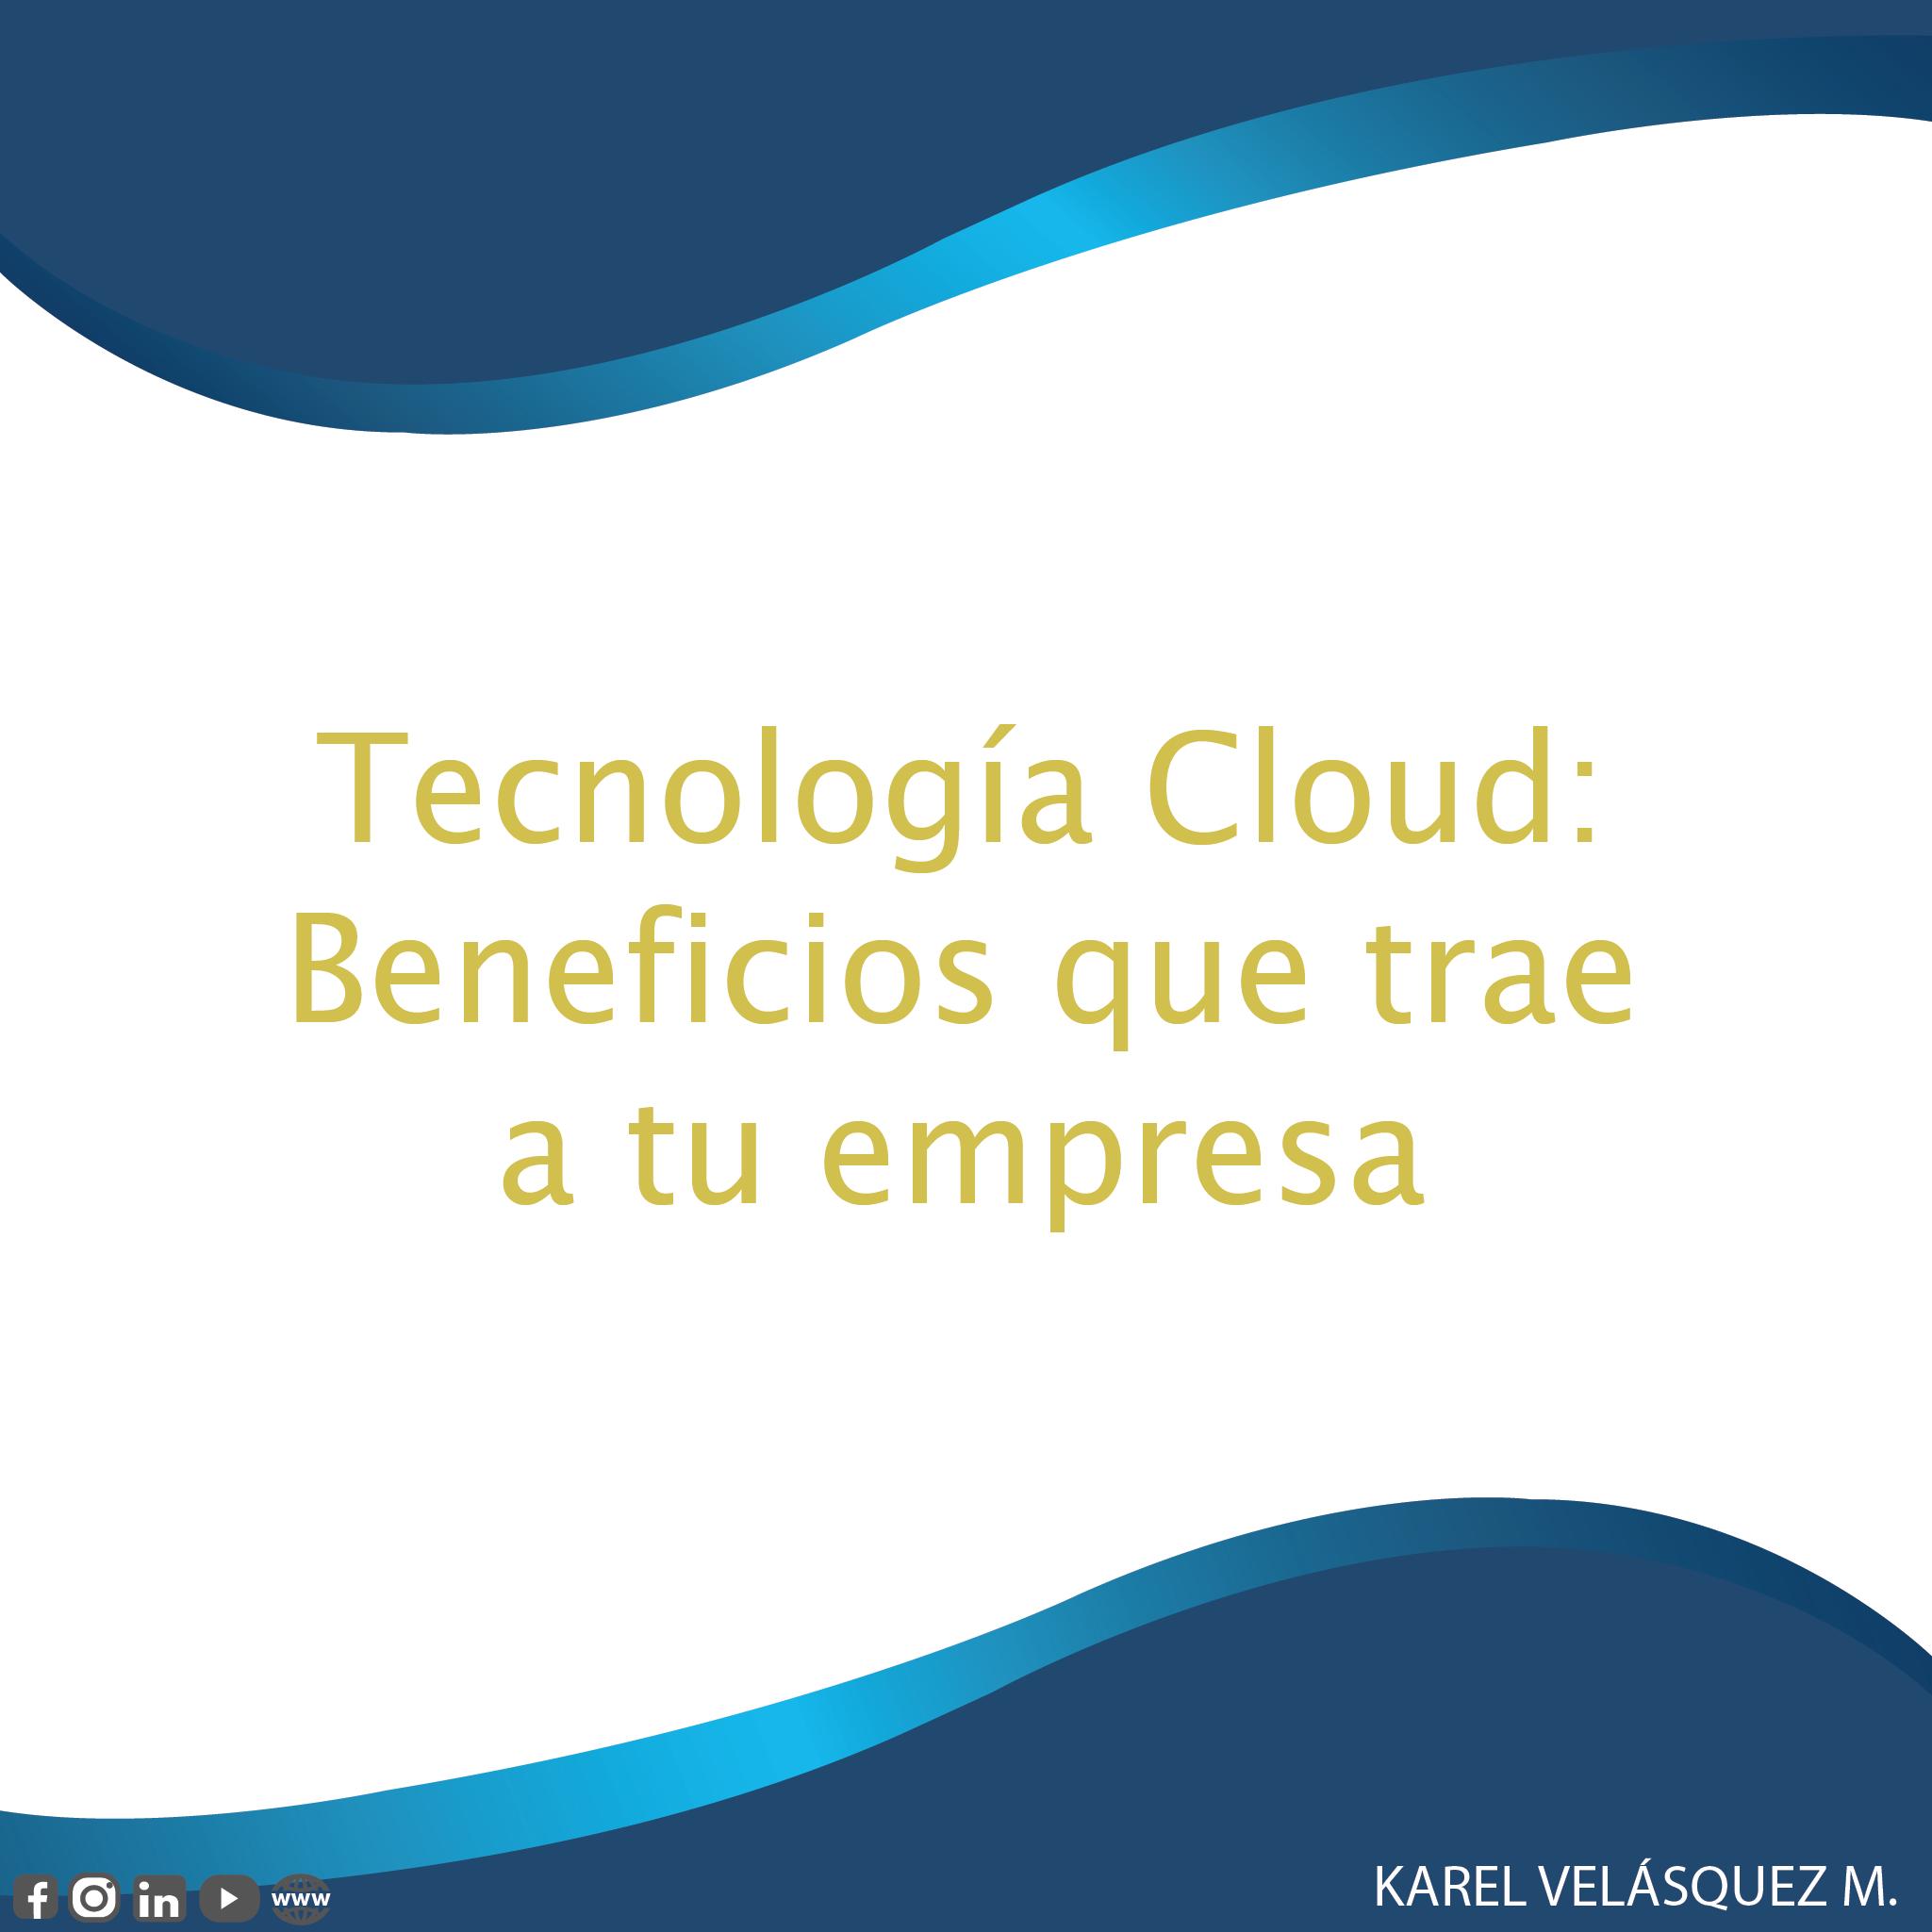 Tecnología Cloud: Beneficios que trae a tu empresa